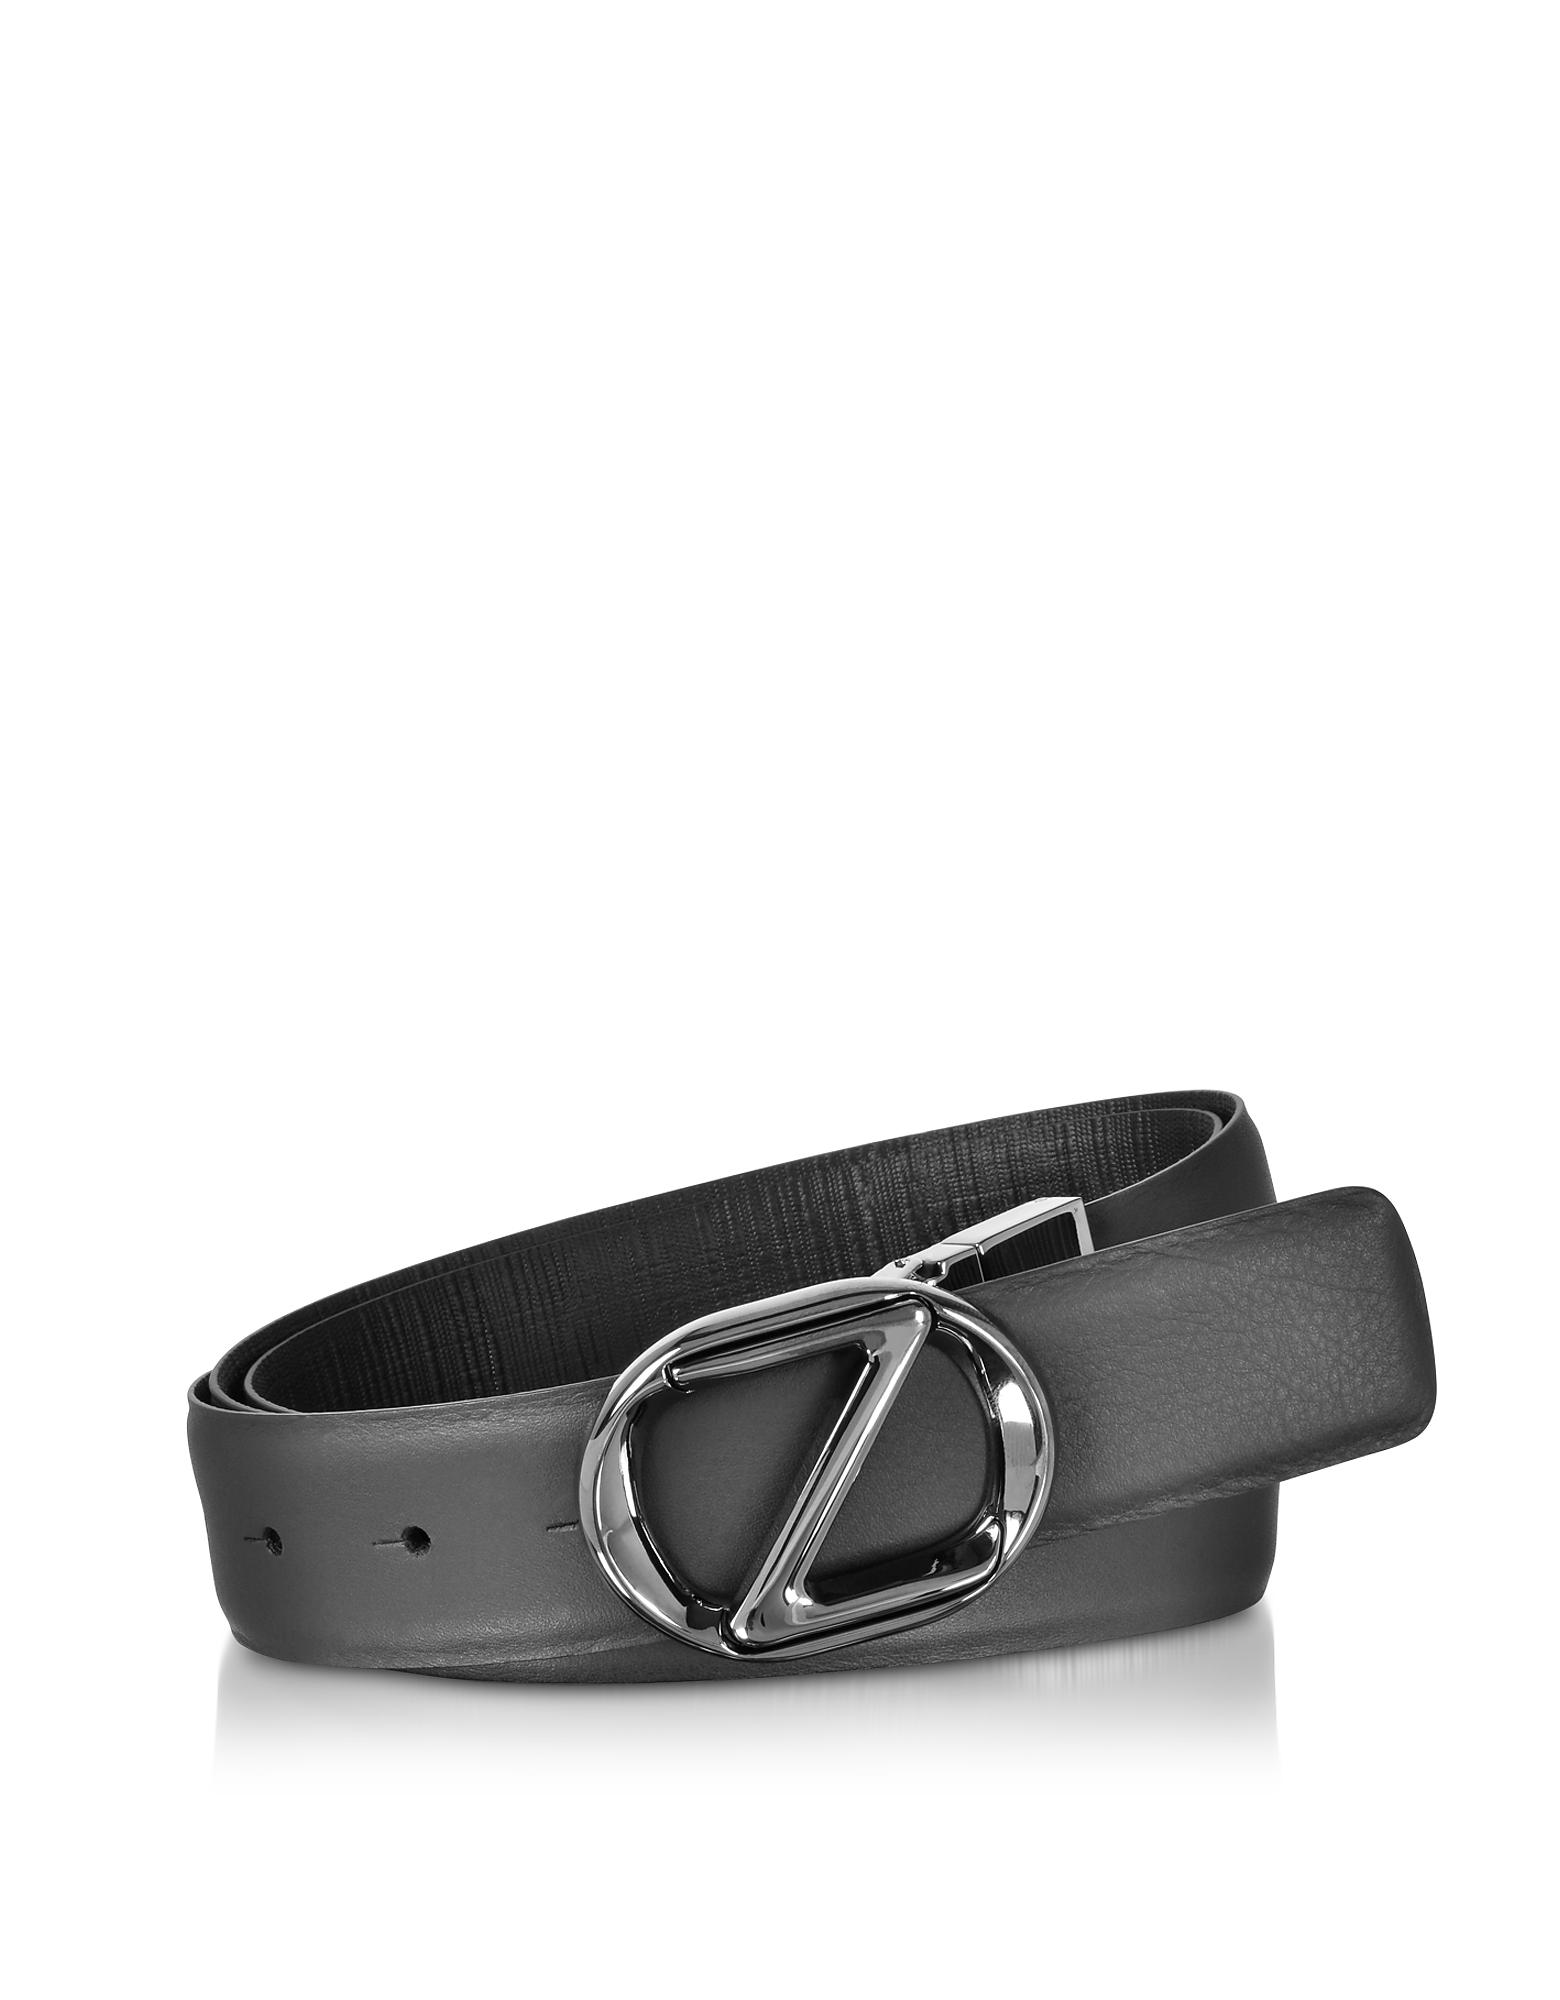 Black Smooth/Embossed Leather Adjustable and Reversible Men's Belt